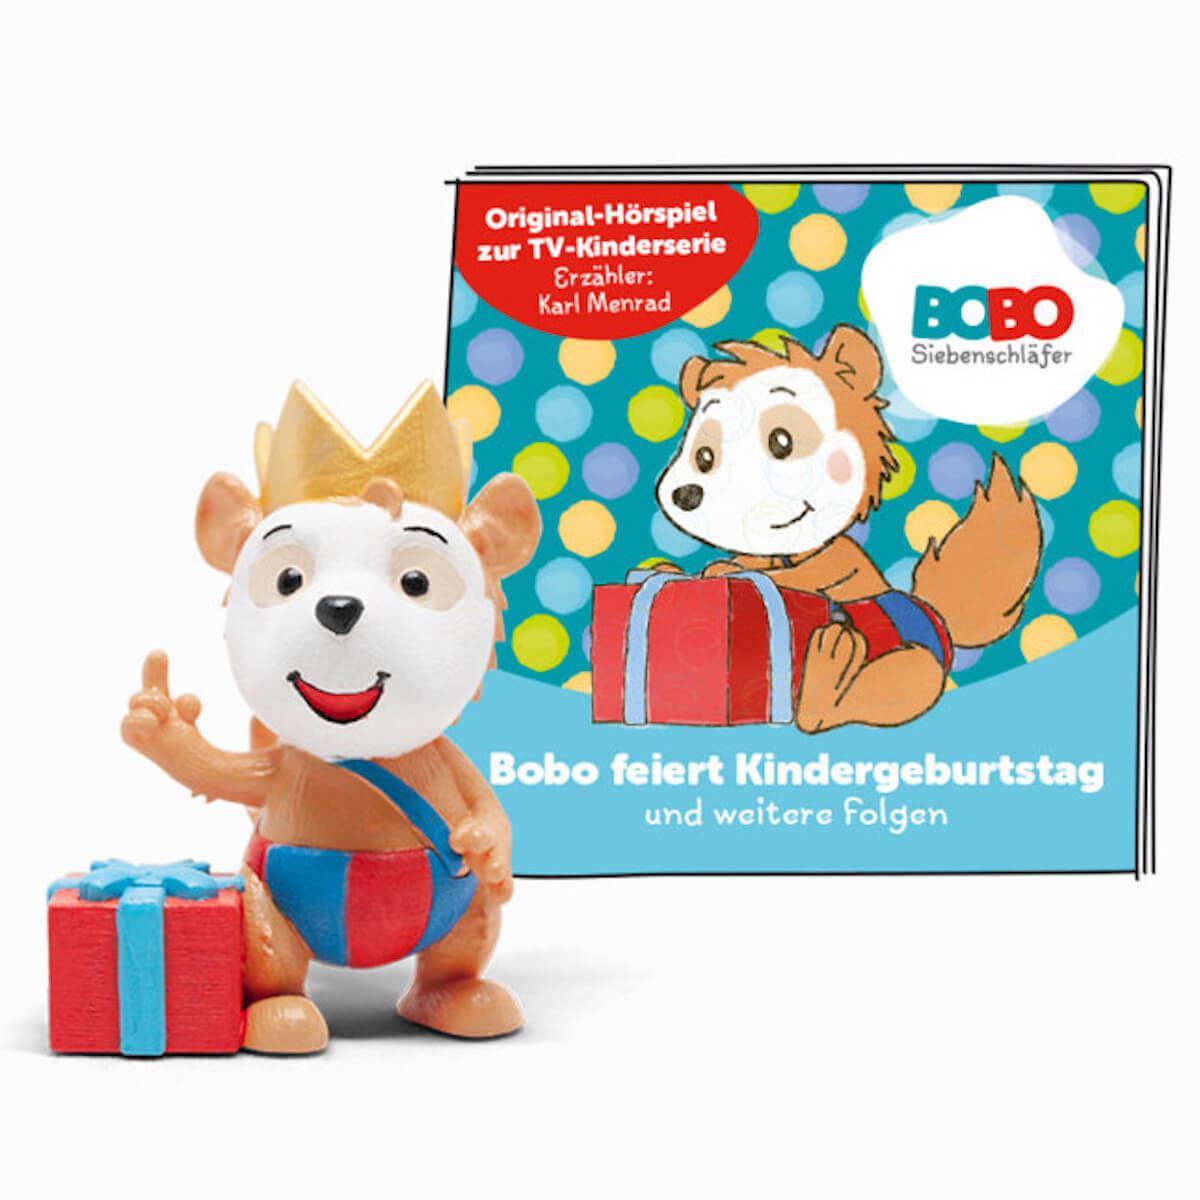 Hörspielfigur TONIES Bobo Siebenschläfer Kindergeburtstag